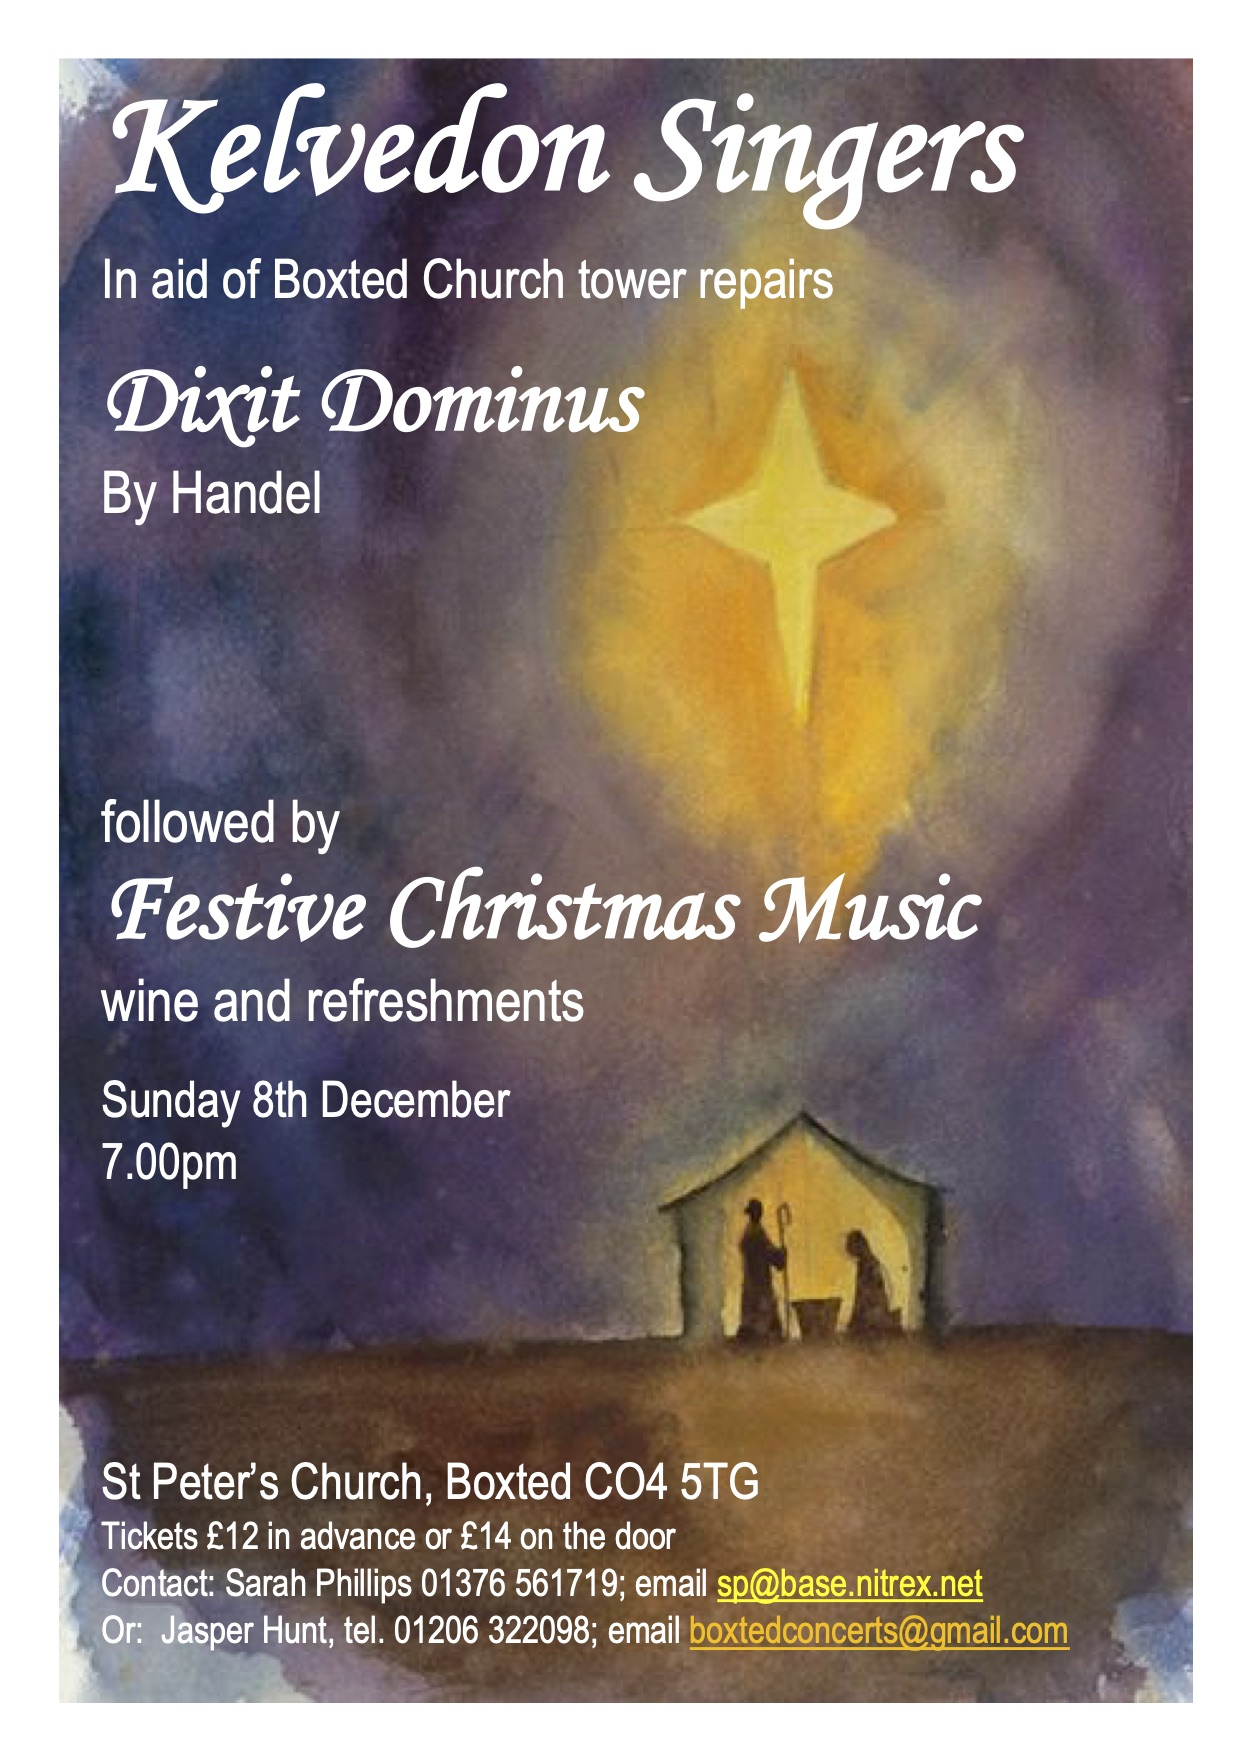 Kelvedon Singers Festive Christmas Music Sunday 8th Deember 7.00pm St Peter's Church, Boxtedwine and refreshments